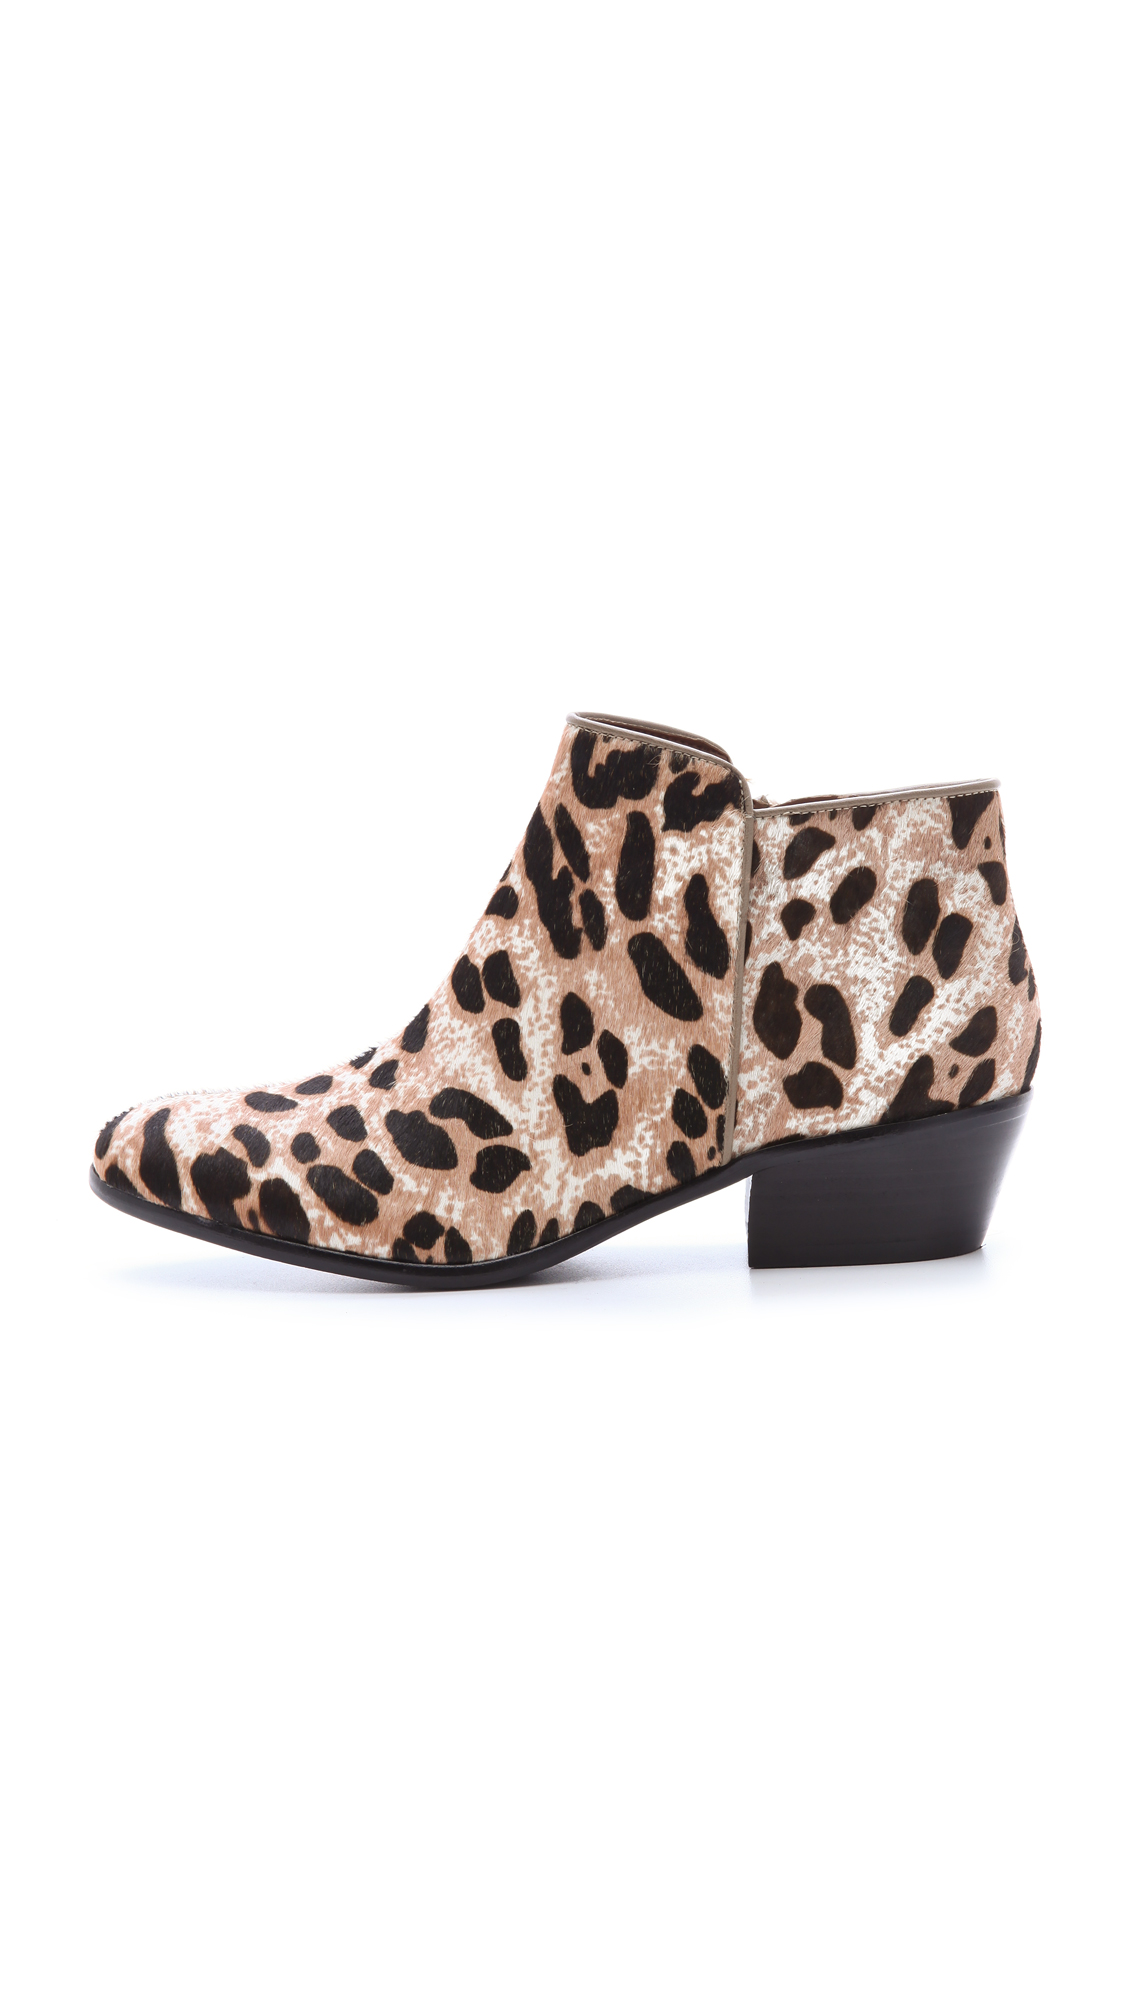 7581c92ca Sam Edelman Petty Ankle Boot Leopard Hair Calf - Best Leopard 2017